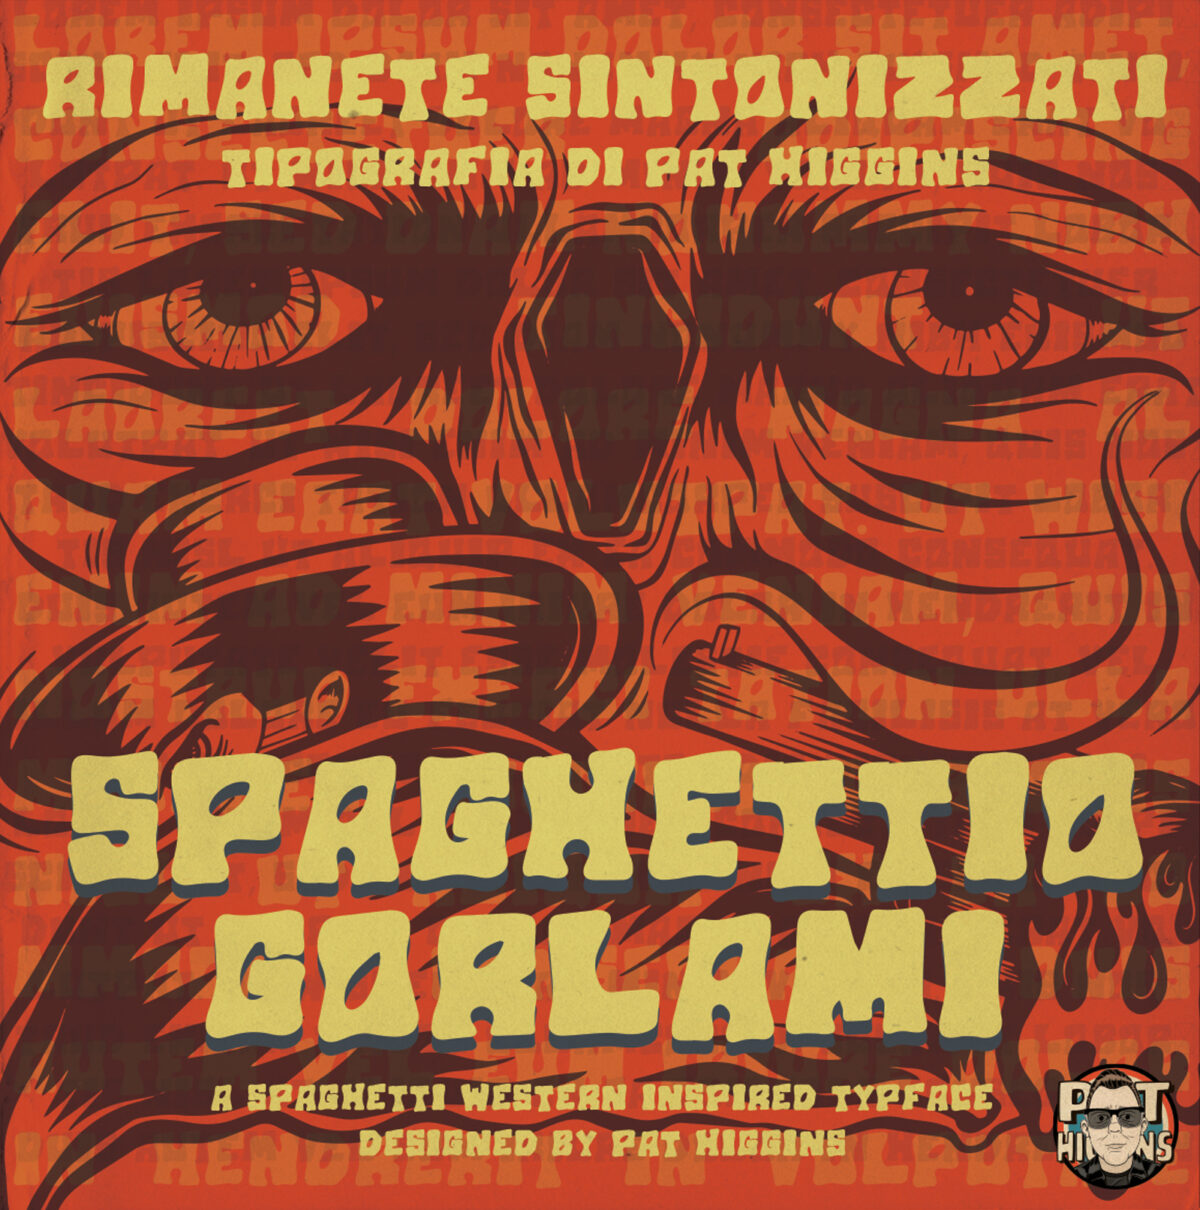 Spaghettio Gorlami – Typeface Design